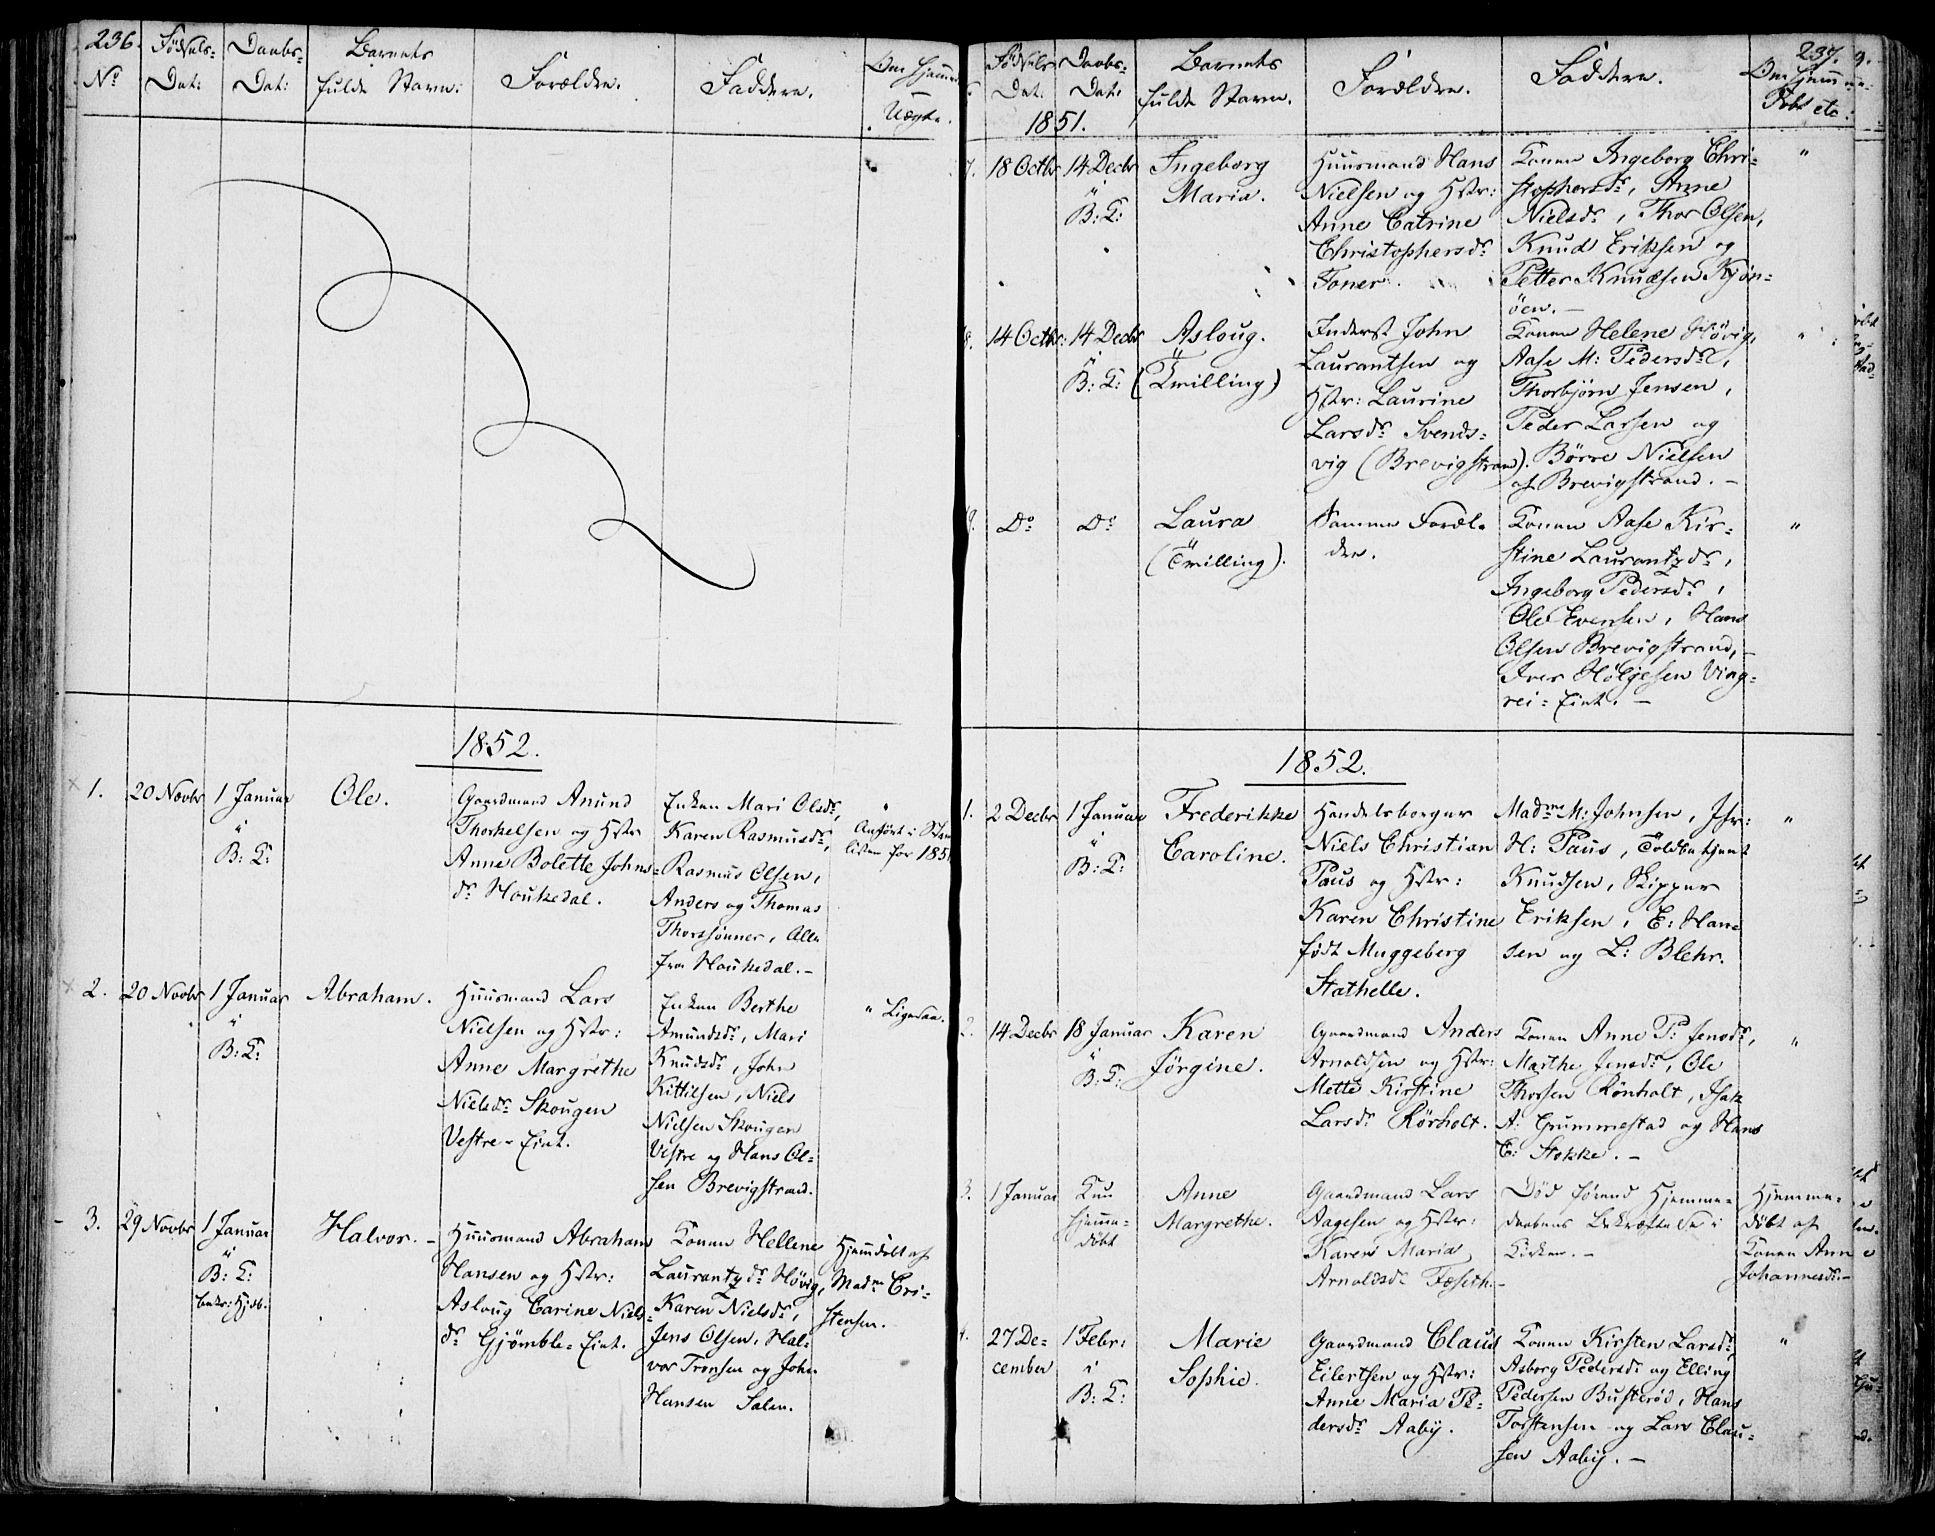 SAKO, Bamble kirkebøker, F/Fa/L0004: Ministerialbok nr. I 4, 1834-1853, s. 236-237